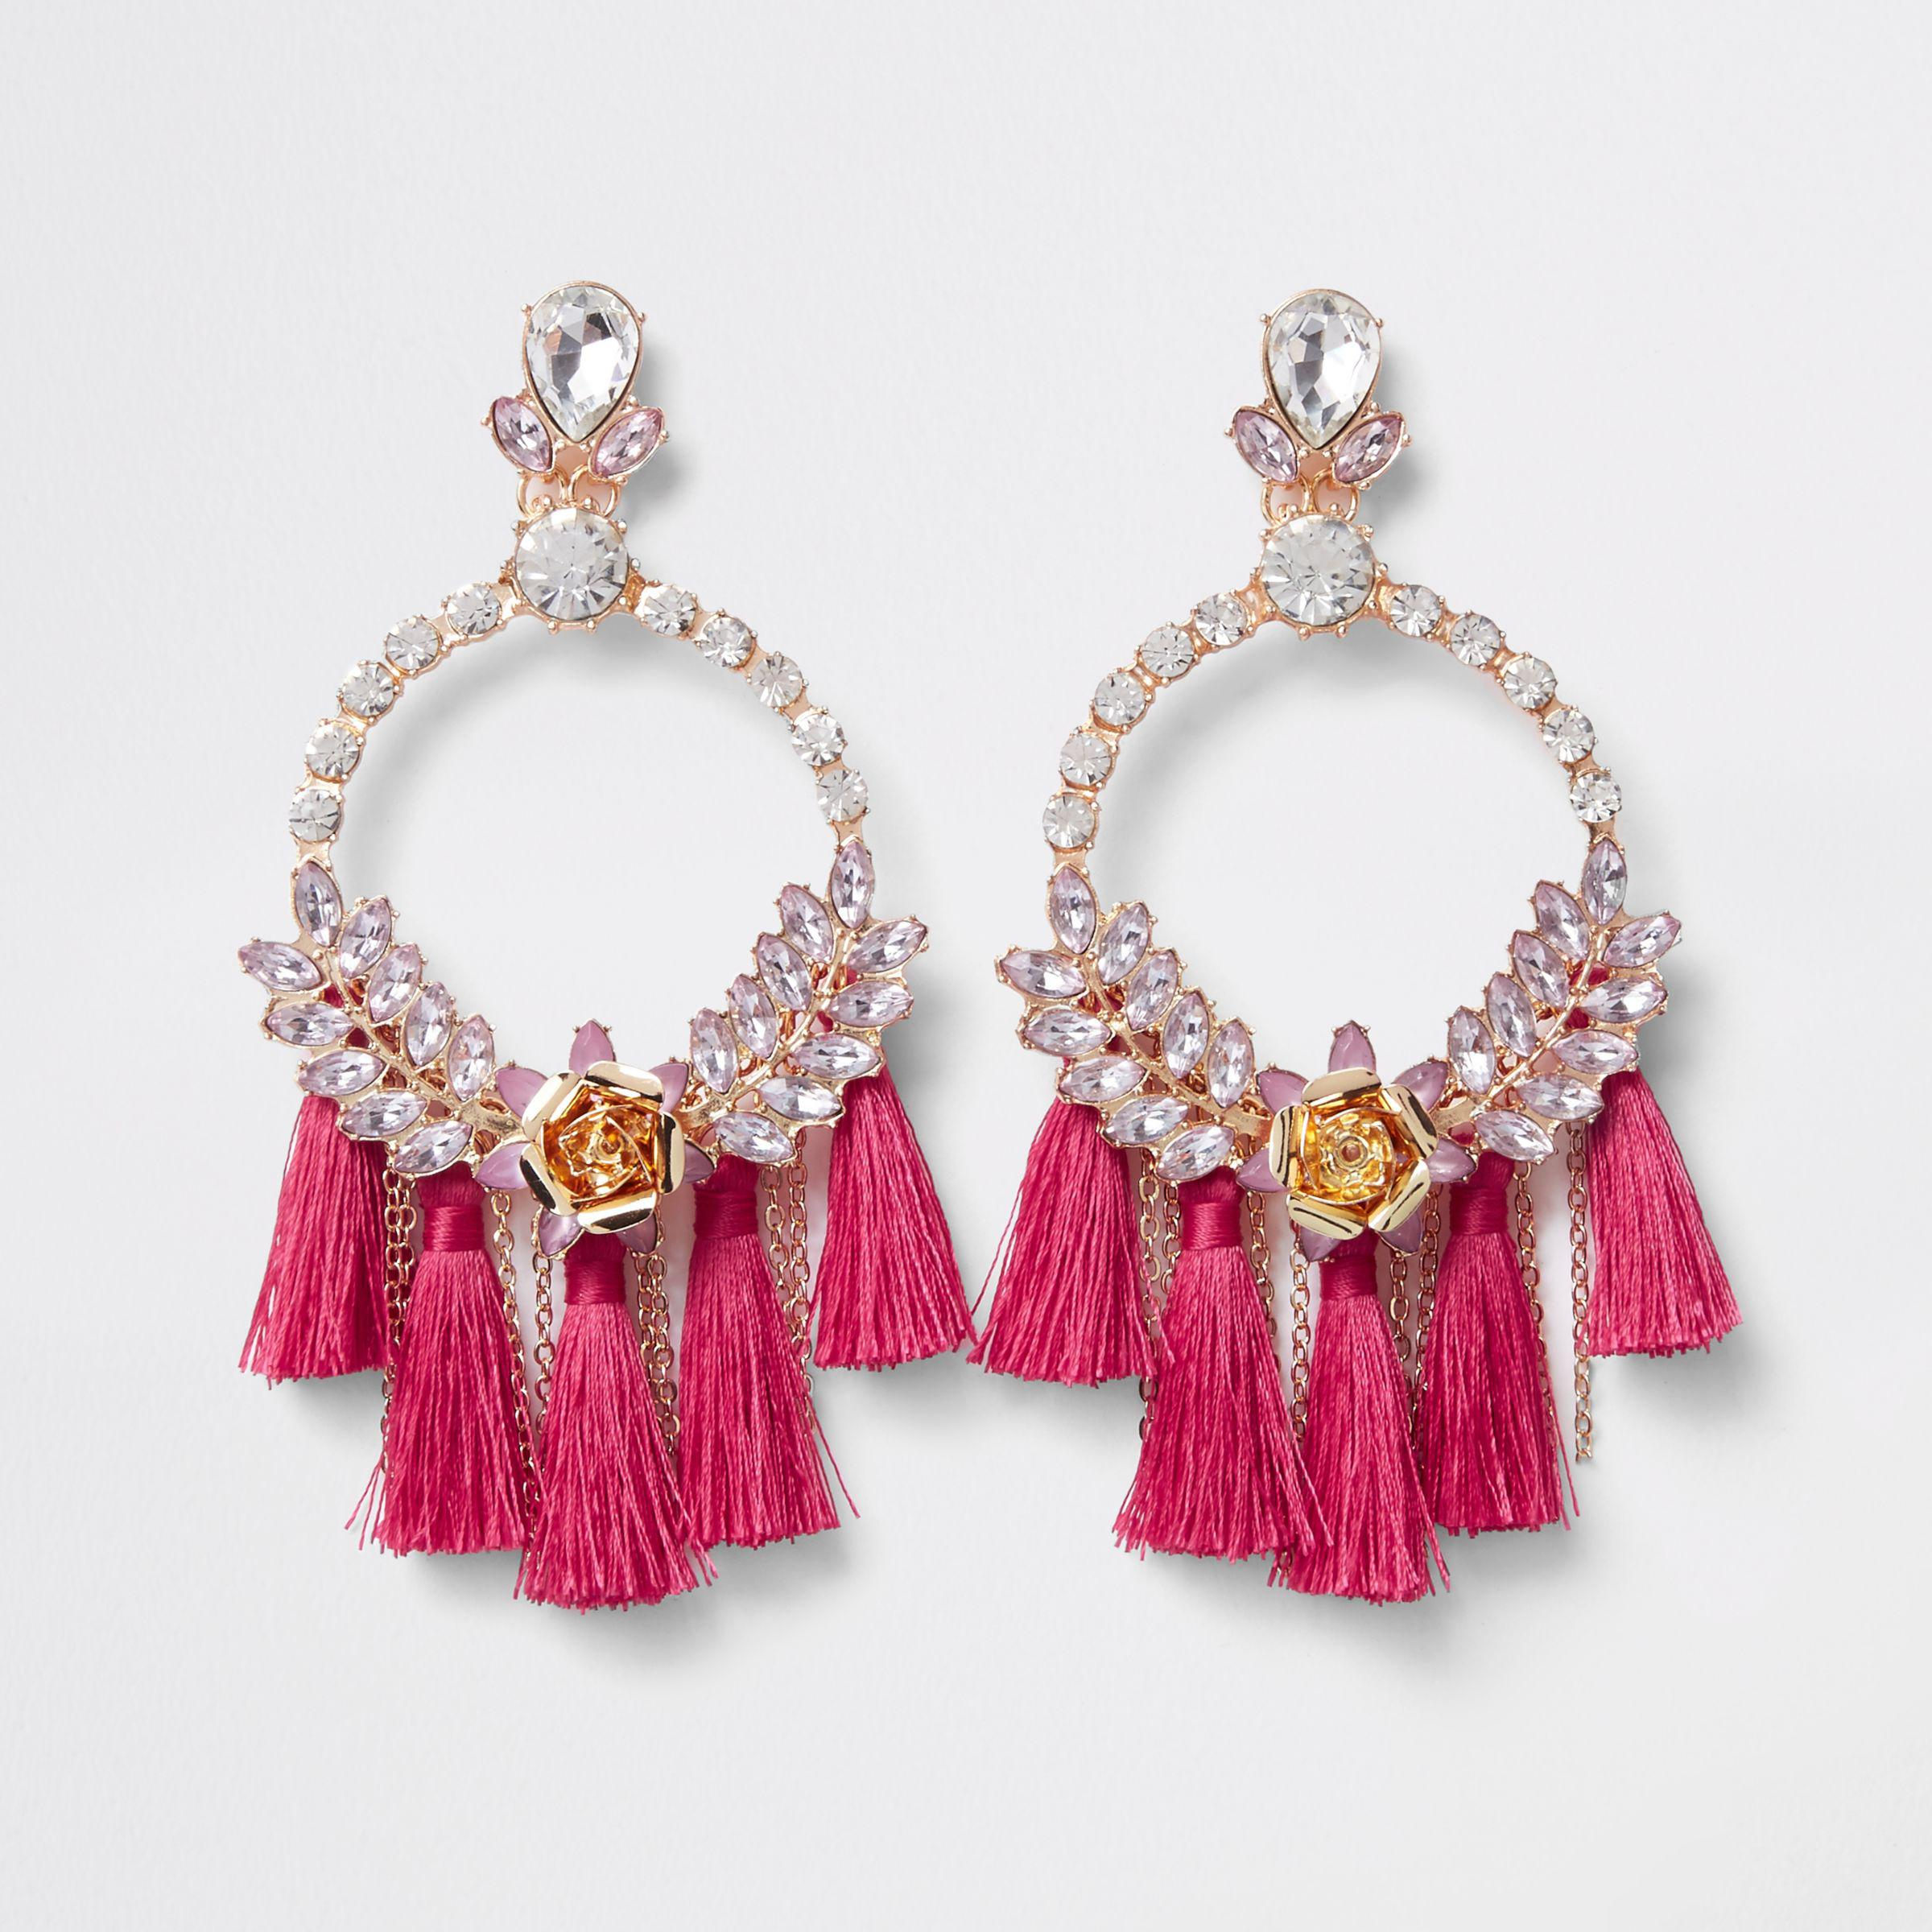 60c406a0b16db River Island Pink Jewel Hoop Tassel Drop Earrings